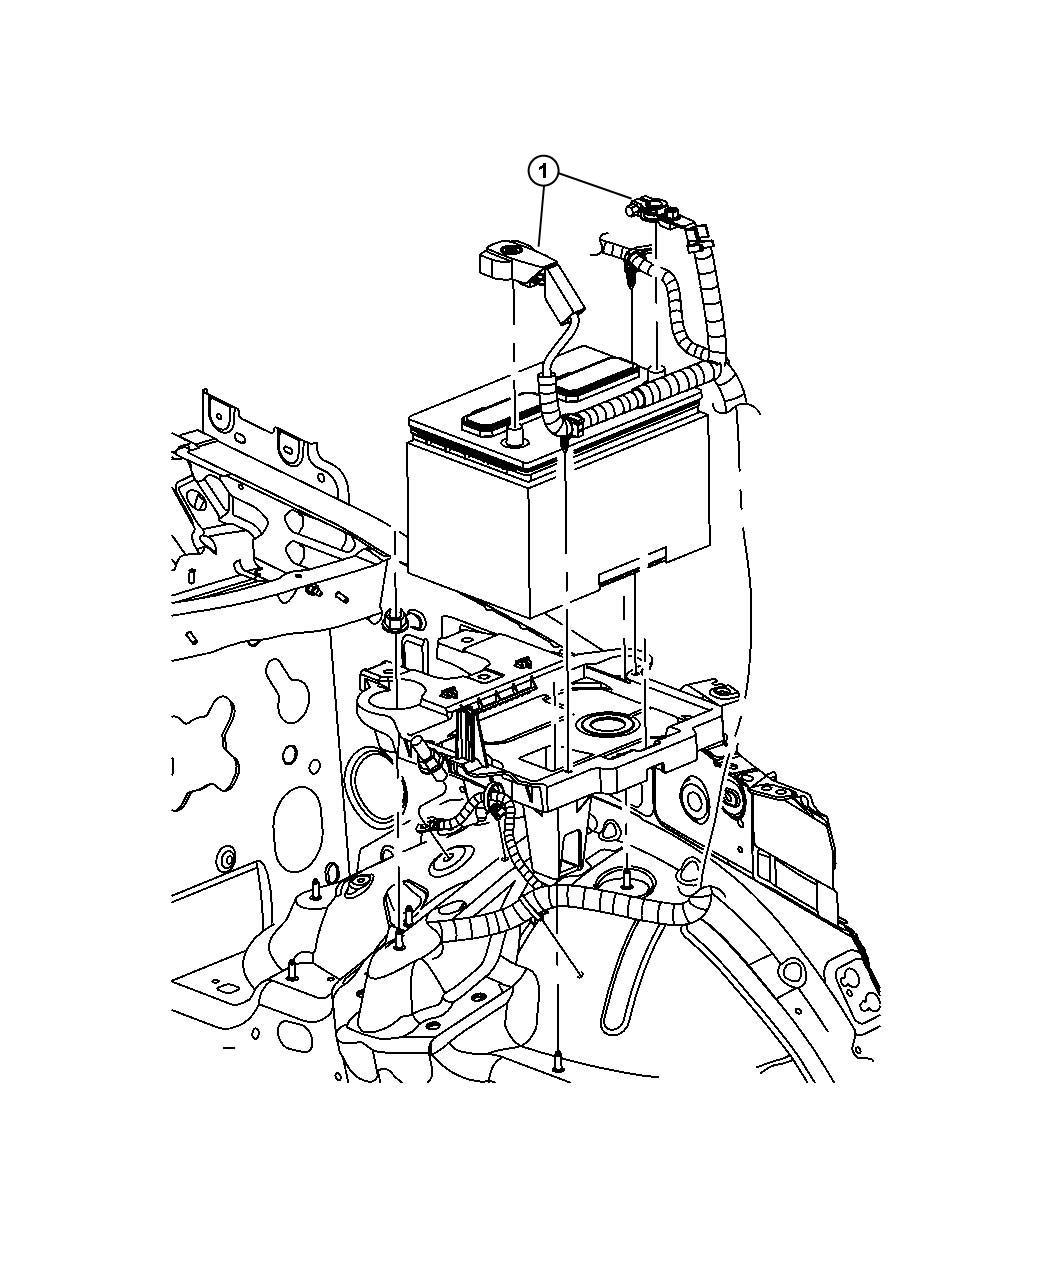 wiring diagram for 2007 dodge nitro